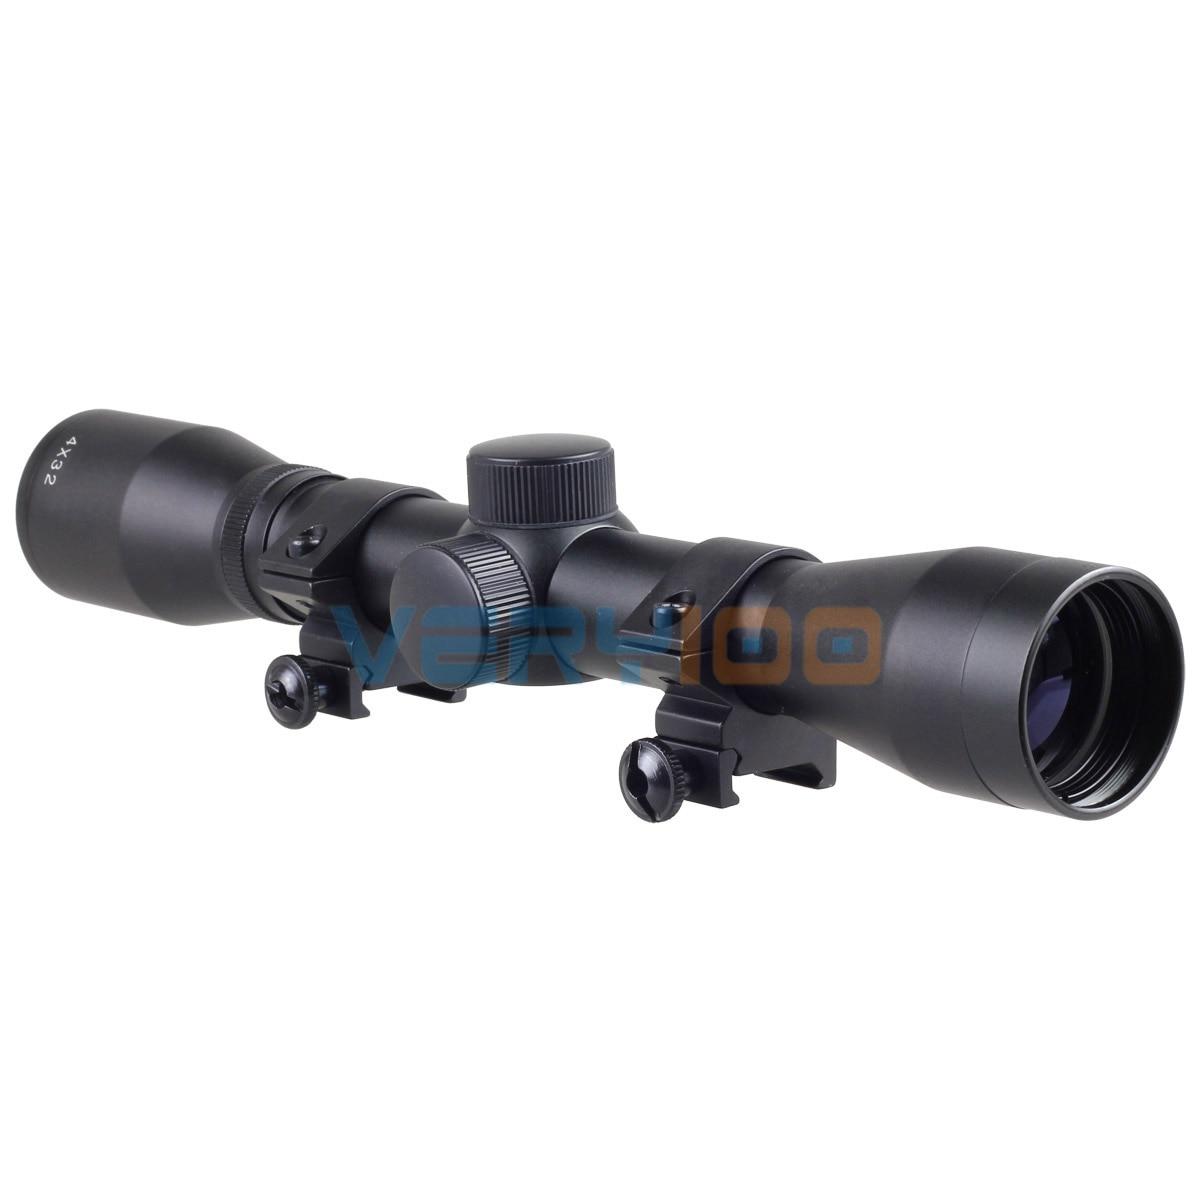 Hunting Tactical 4 x 32 Rifle Optics Sniper Scope Reviews Sight Hunting Telescopic Scopes tactical 4 x 32 air rifle optics sniper scope reviews sight hunting riflescope scopes rail mount 20mm